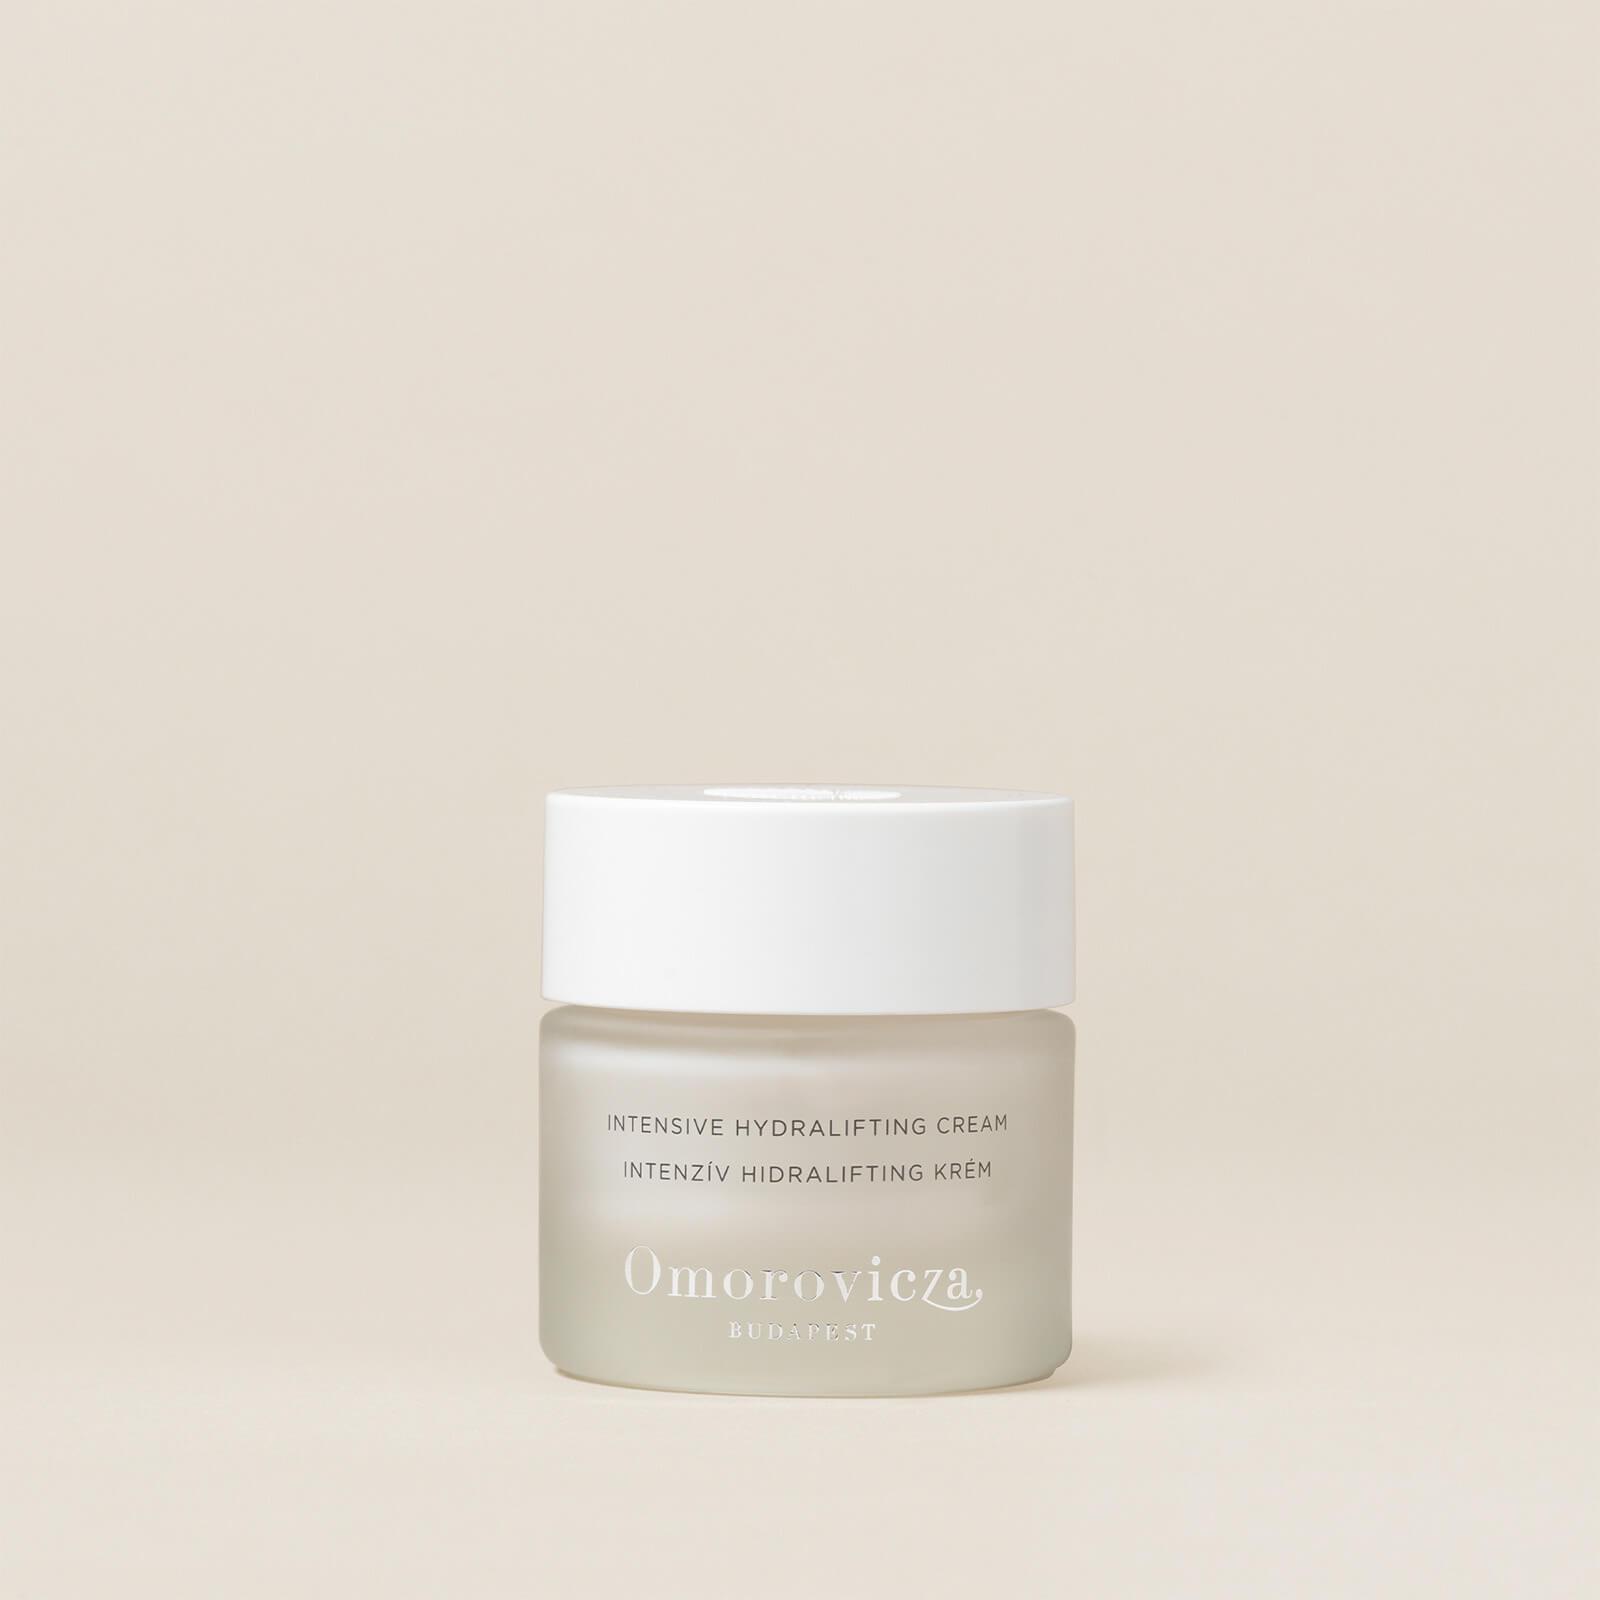 Купить Лифтинг-крем Omorovicza Intensive Hydra-Lifting Cream (50 мл)